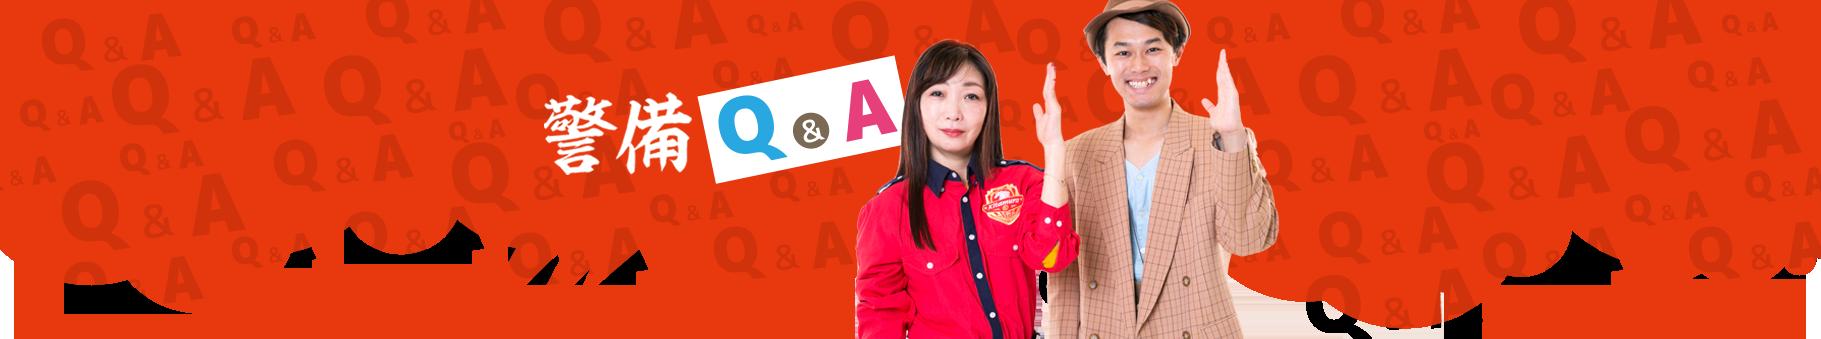 警備Q&A